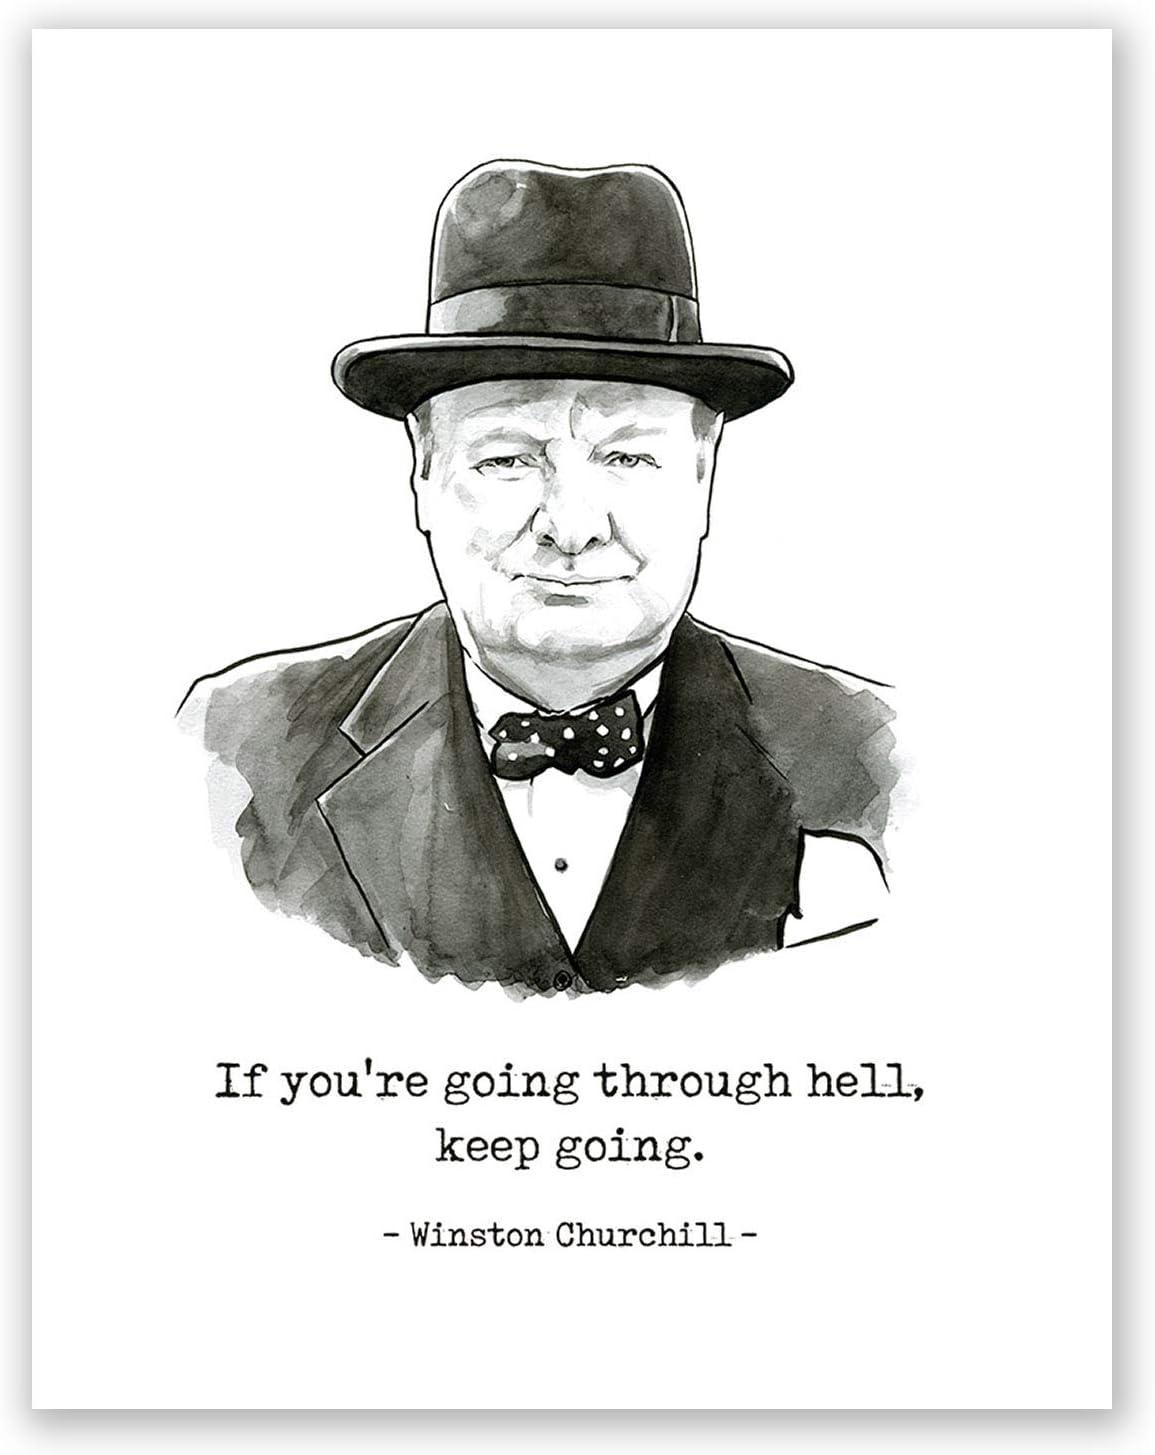 Winston Churchill quote art print wall art poster print  gift film A